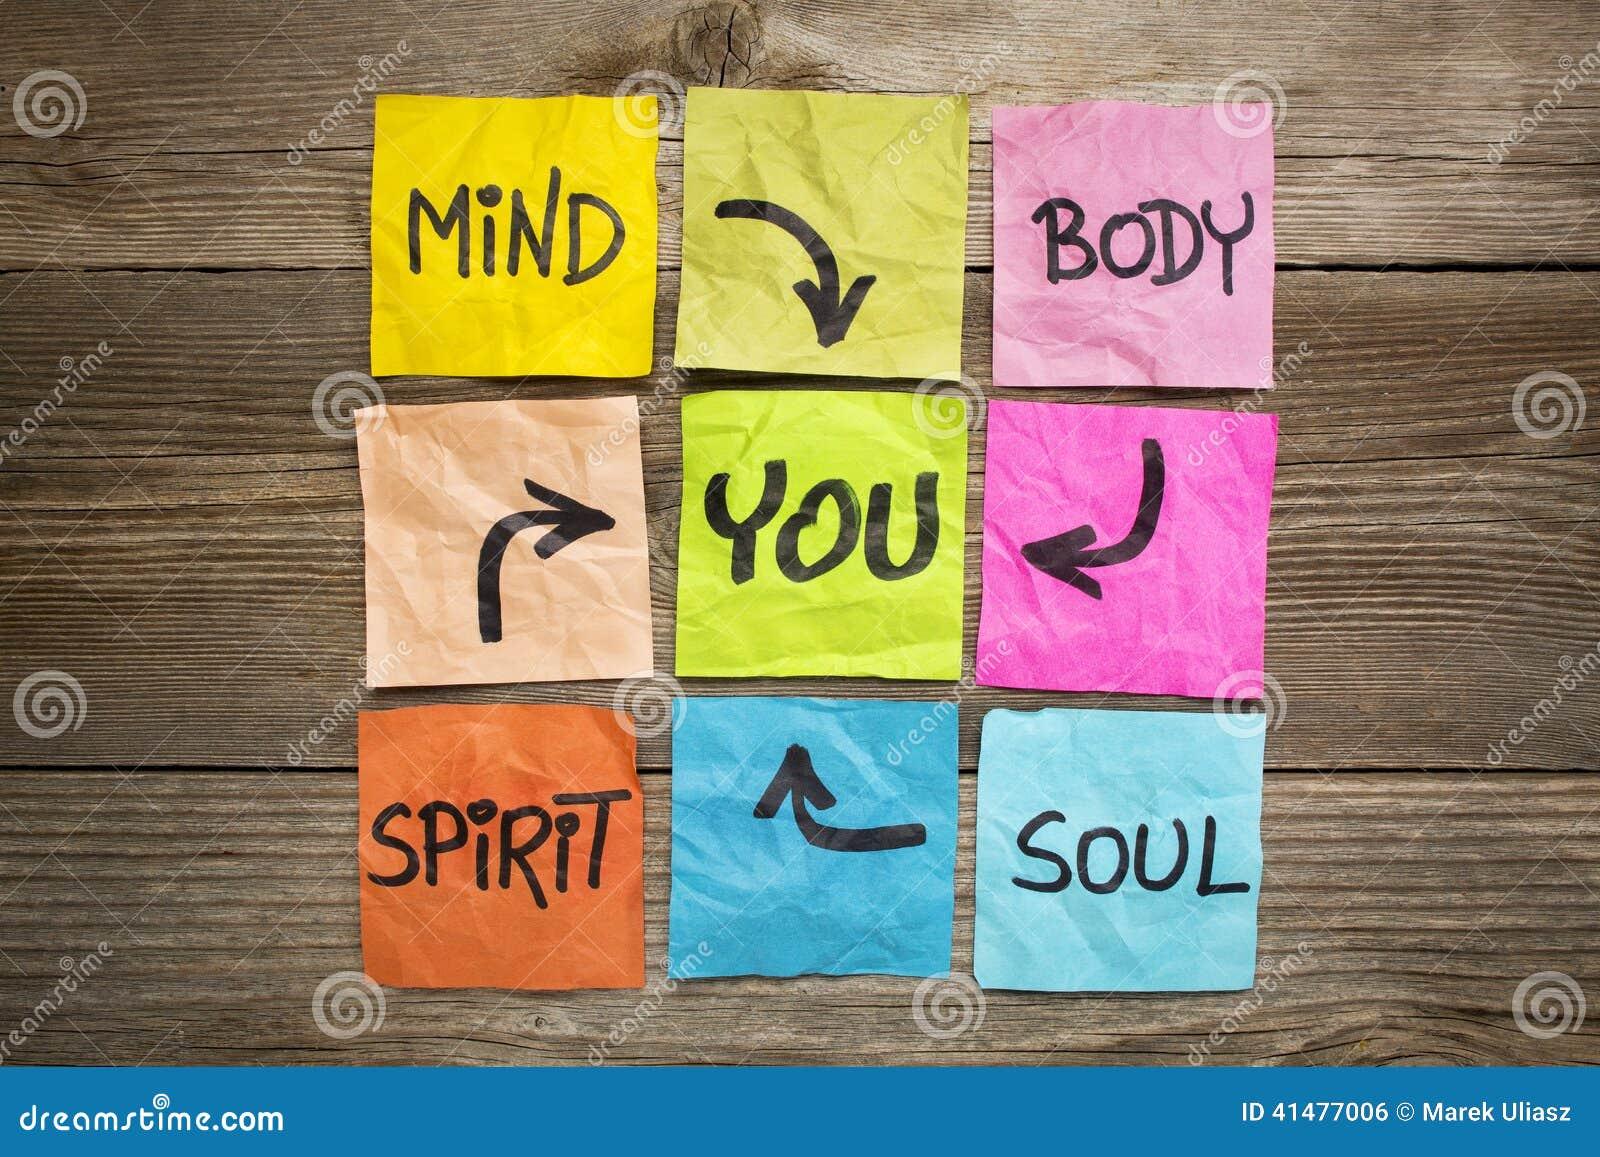 Equilibrio Mente E Espirito: Mente, Corpo, Espírito, Alma E Você Foto De Stock